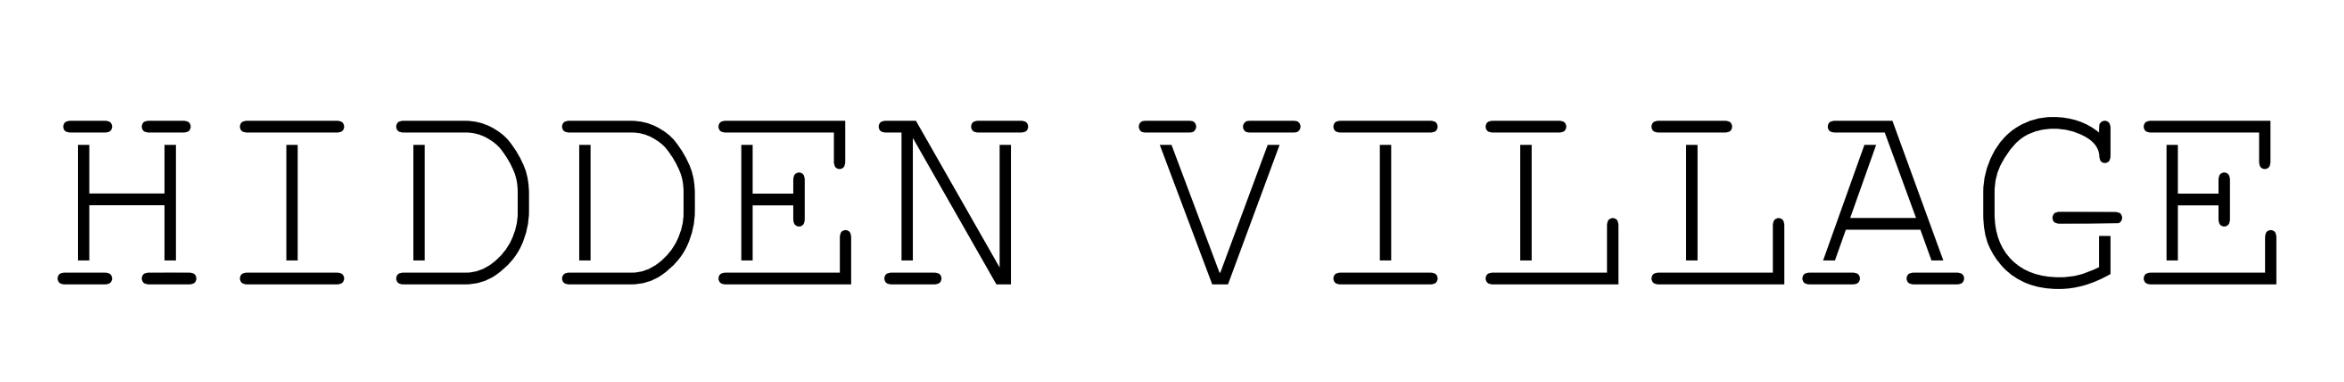 The Hidden Village Logo